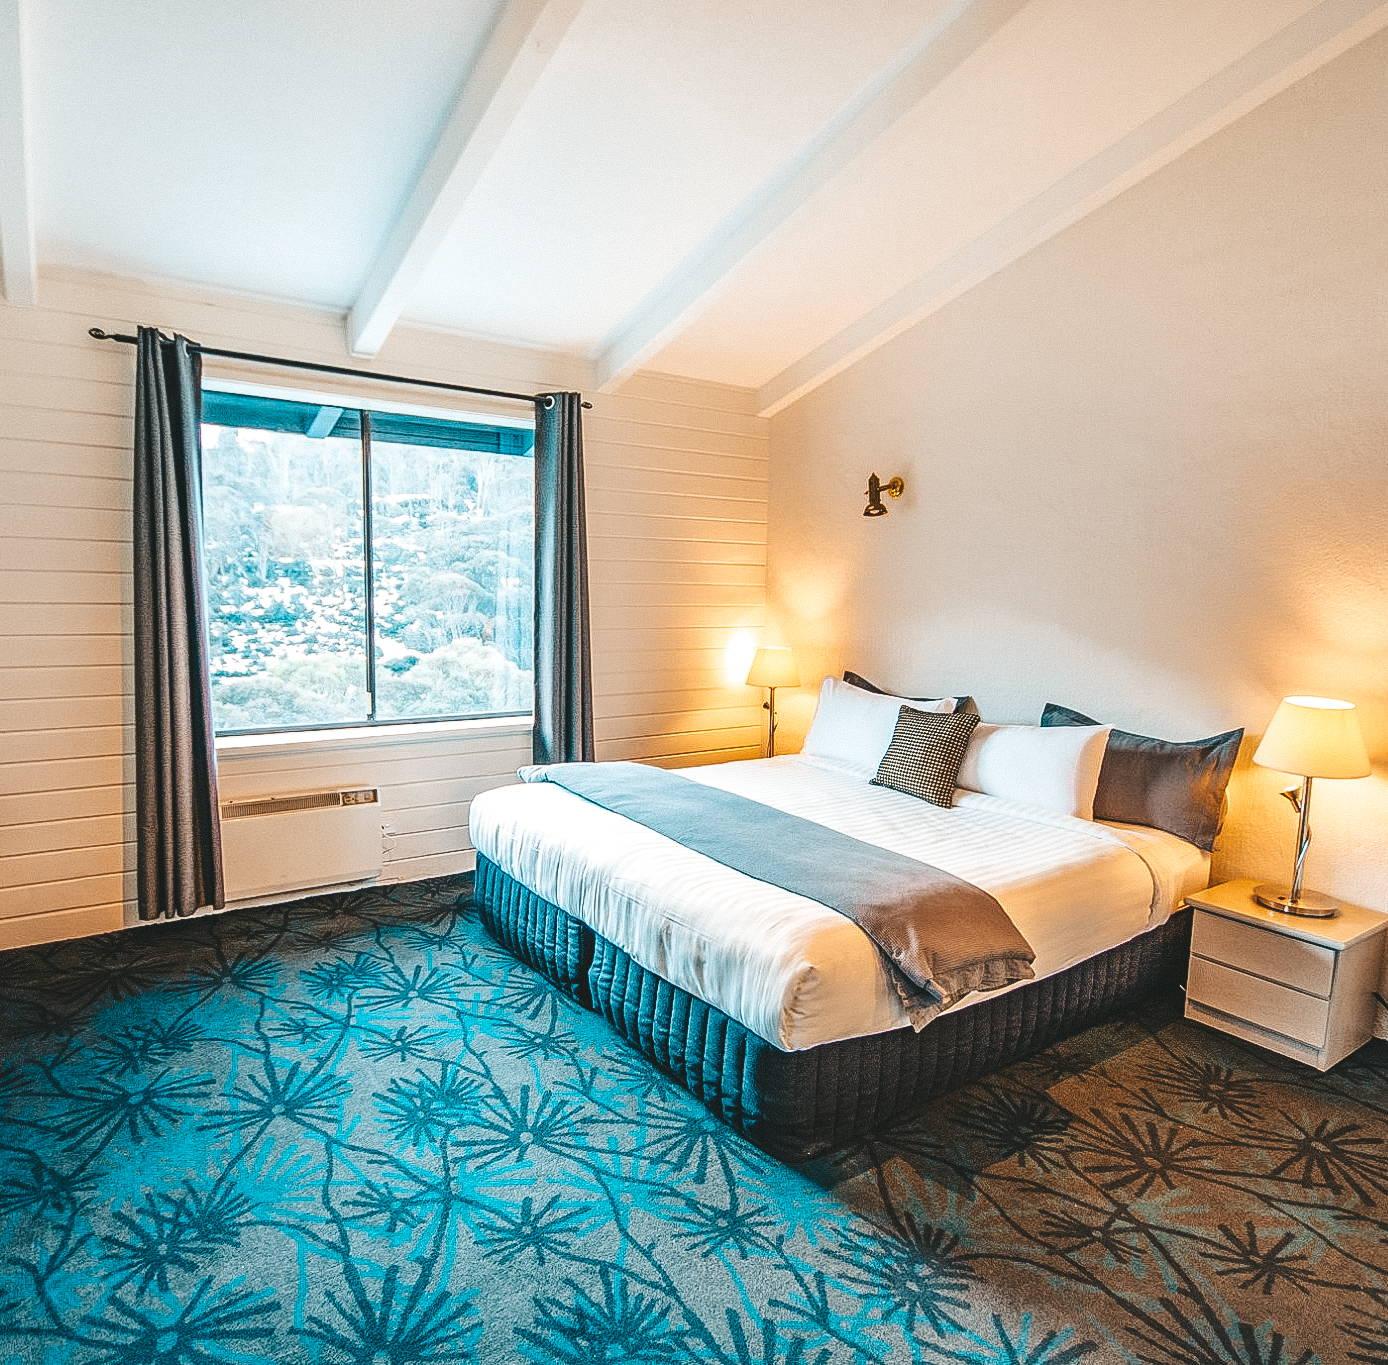 Mountain View Suite Image - Bernti's Thredbo Accommodation